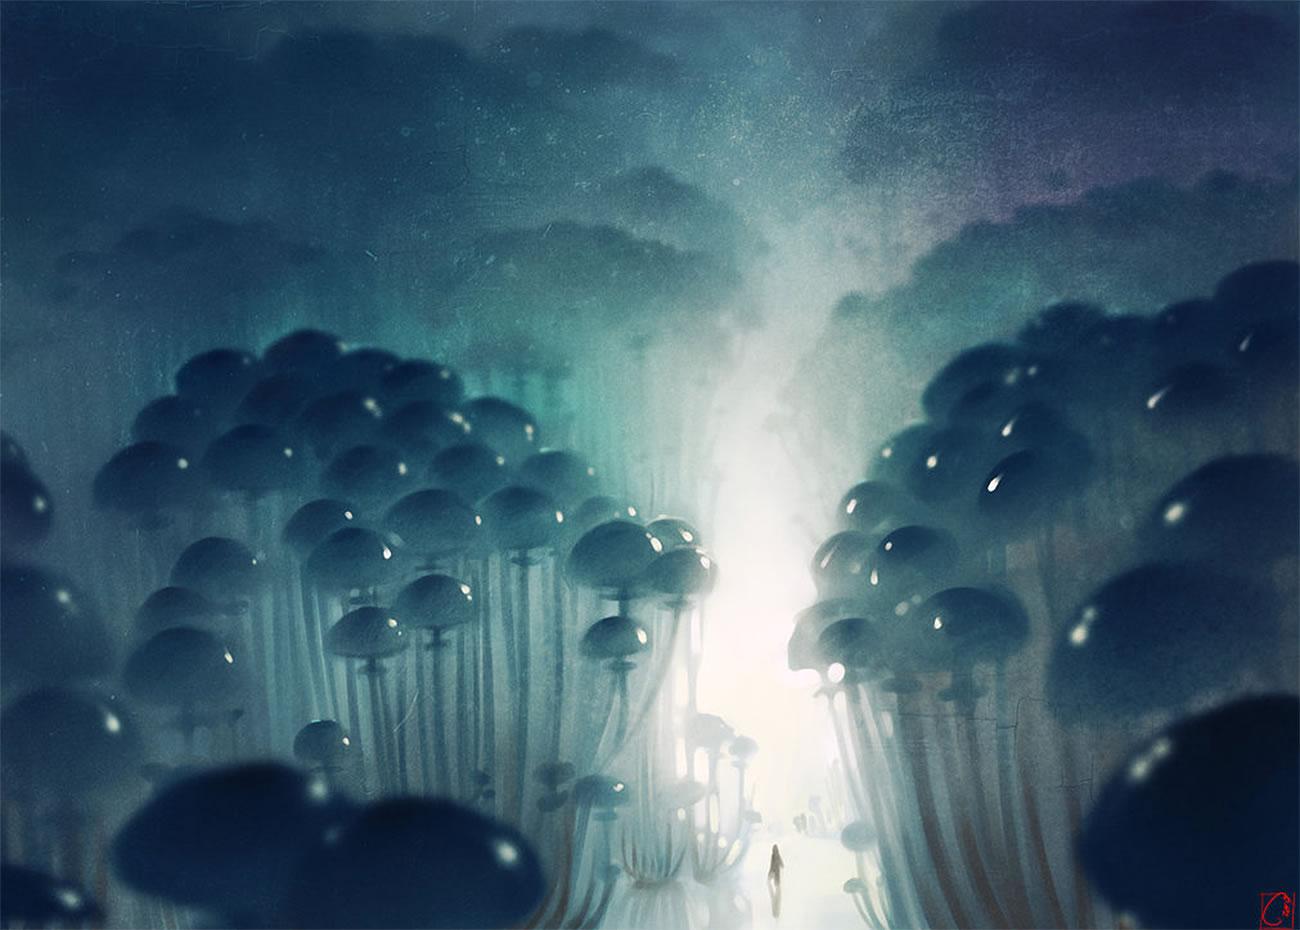 mushrooms and blue sky, digital art by Alexandra Khitrova